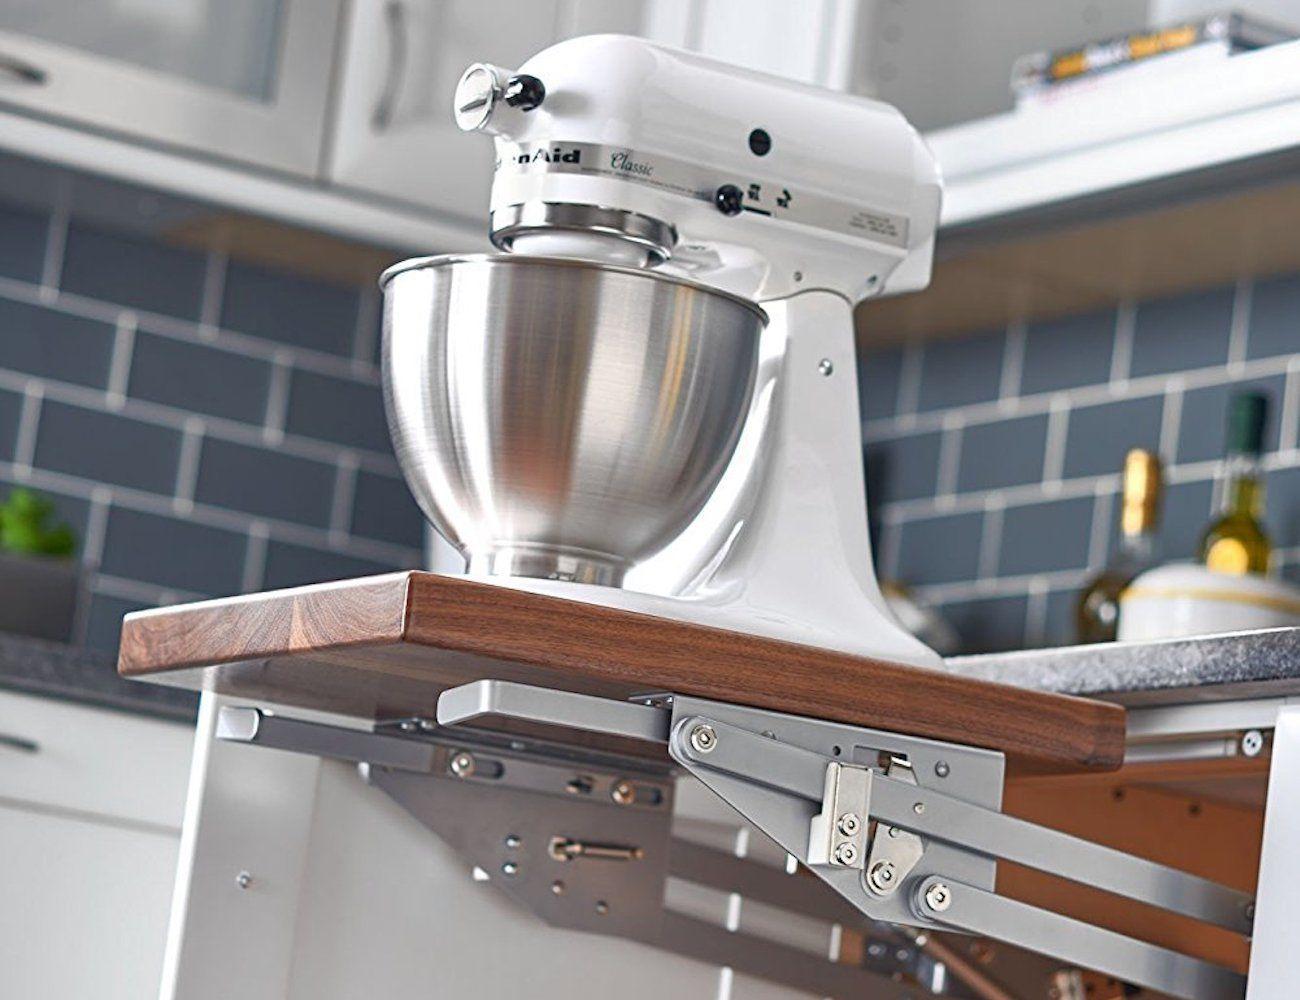 Rev-A-Shelf Appliance Lift with Soft-Close Mechanism